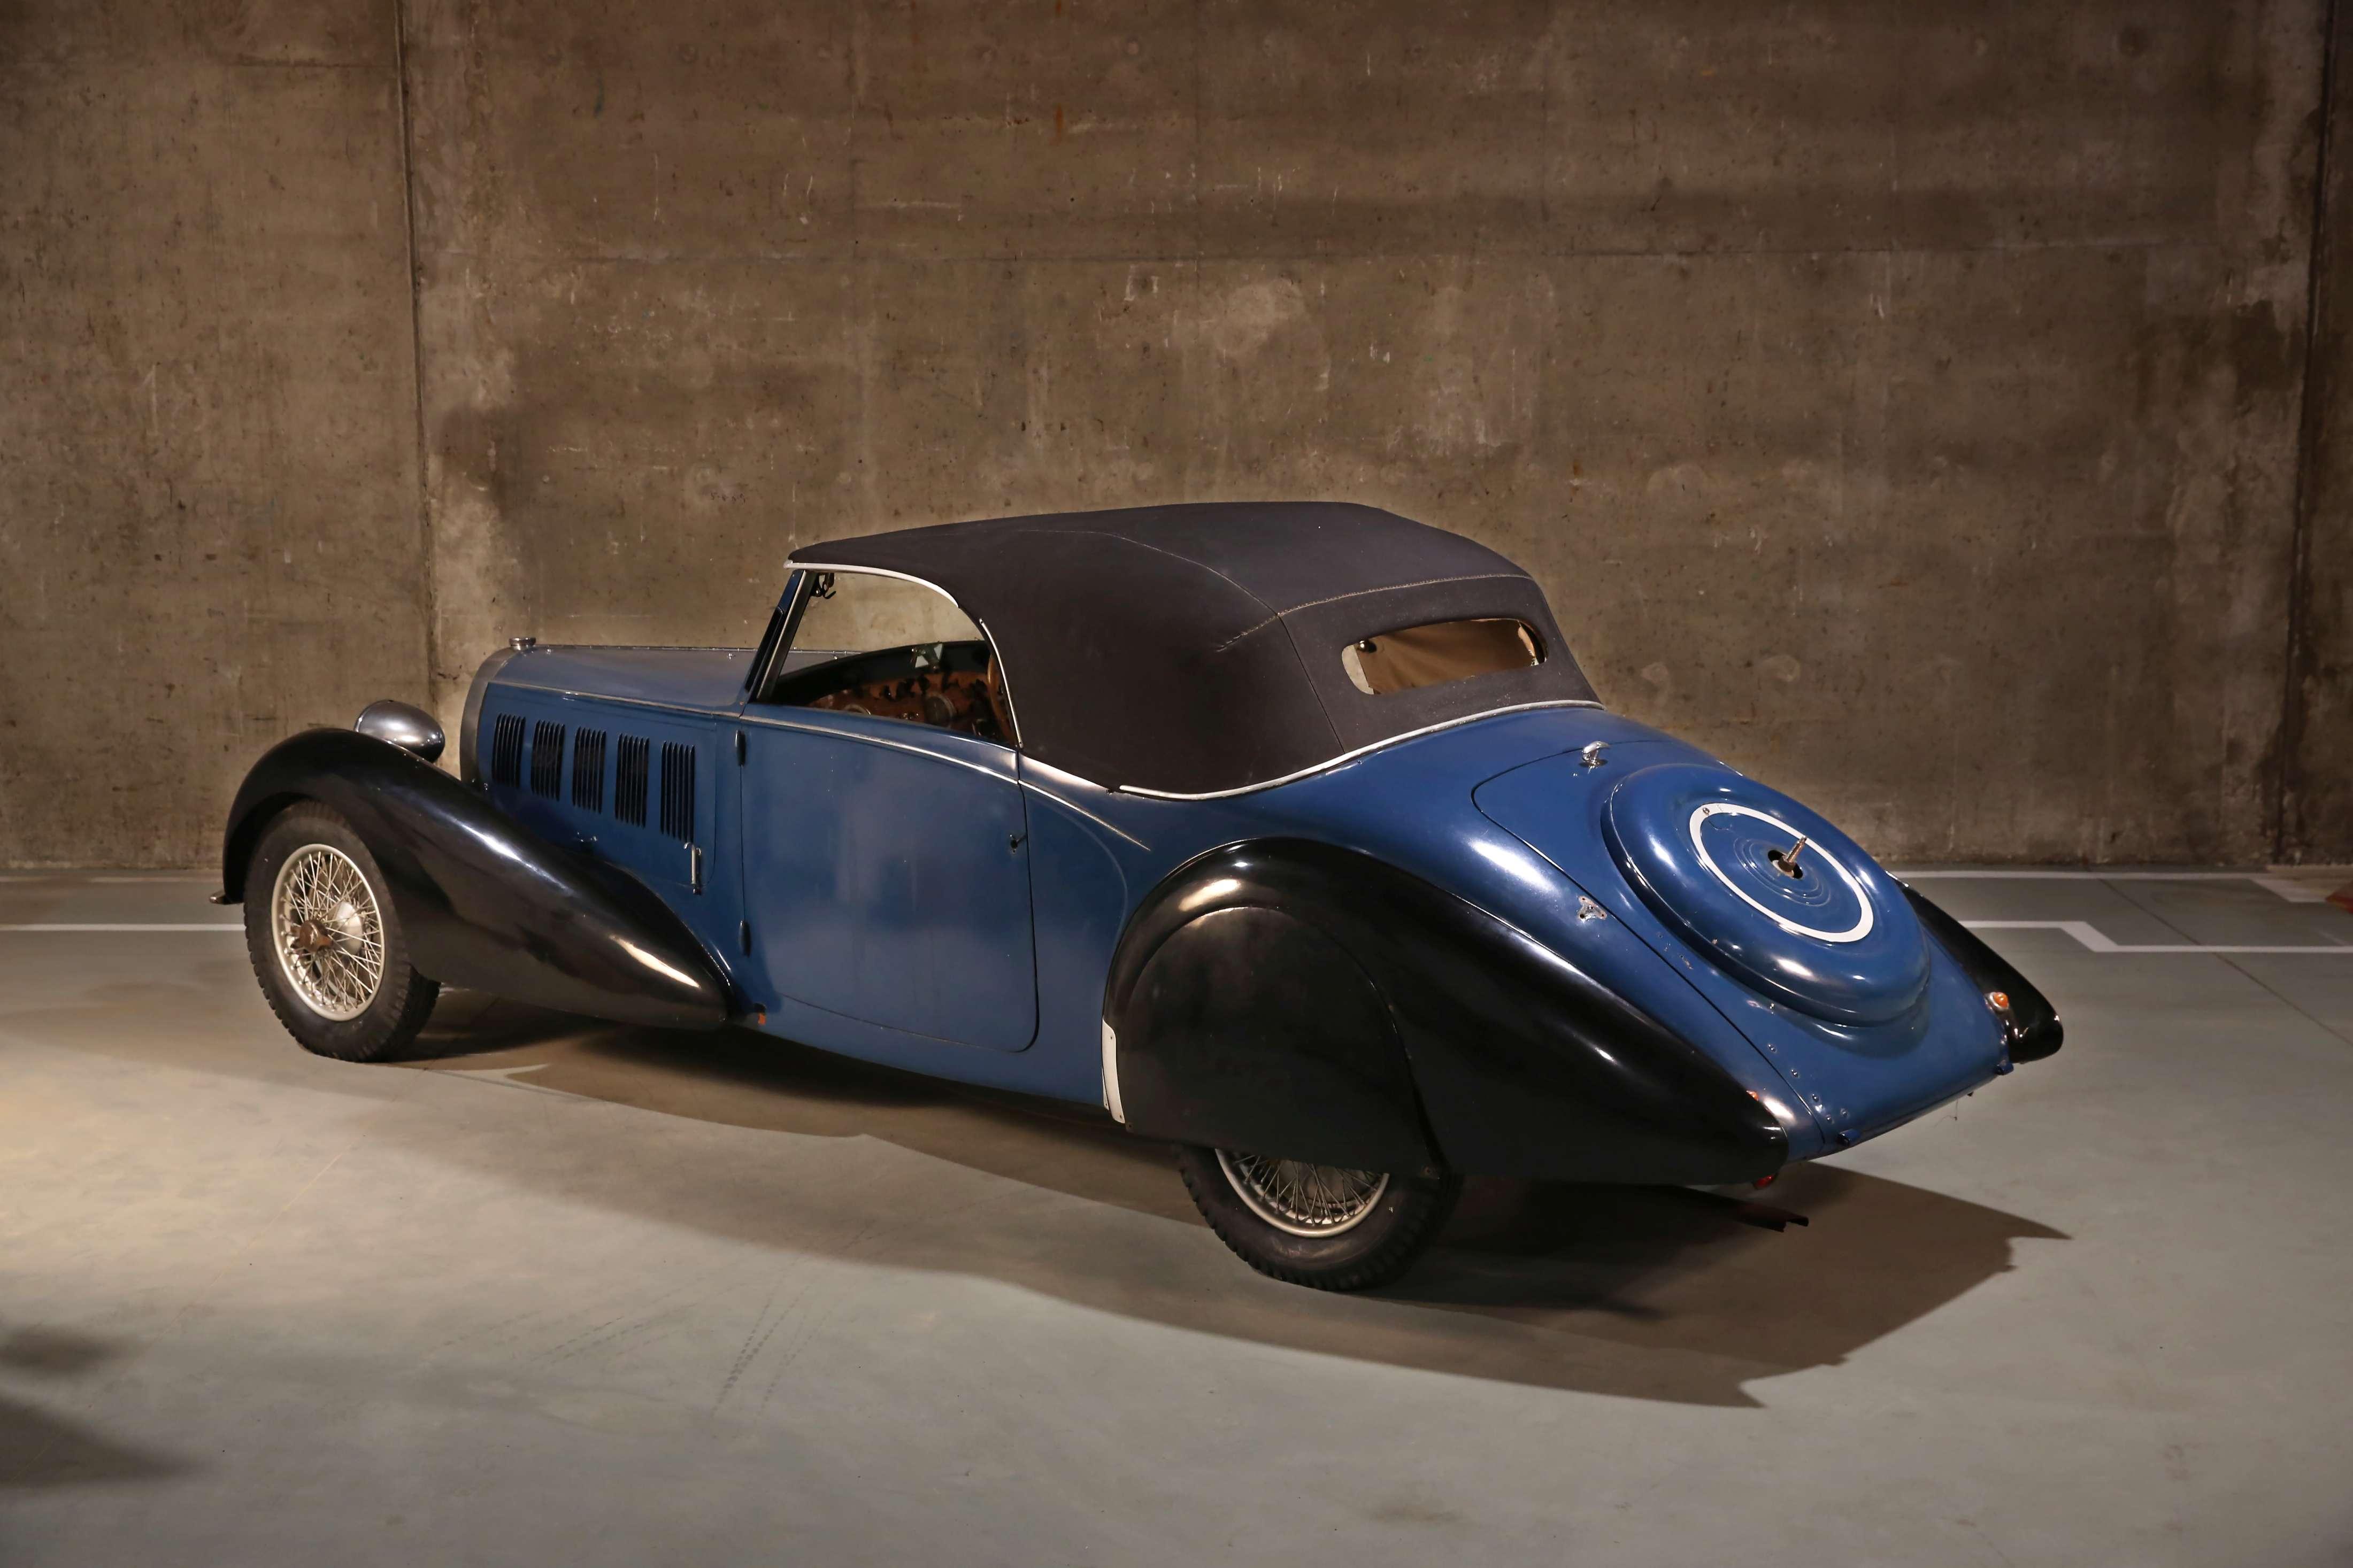 1937 Bugatti Type 57 Cabriolet par Graber rear 3/4